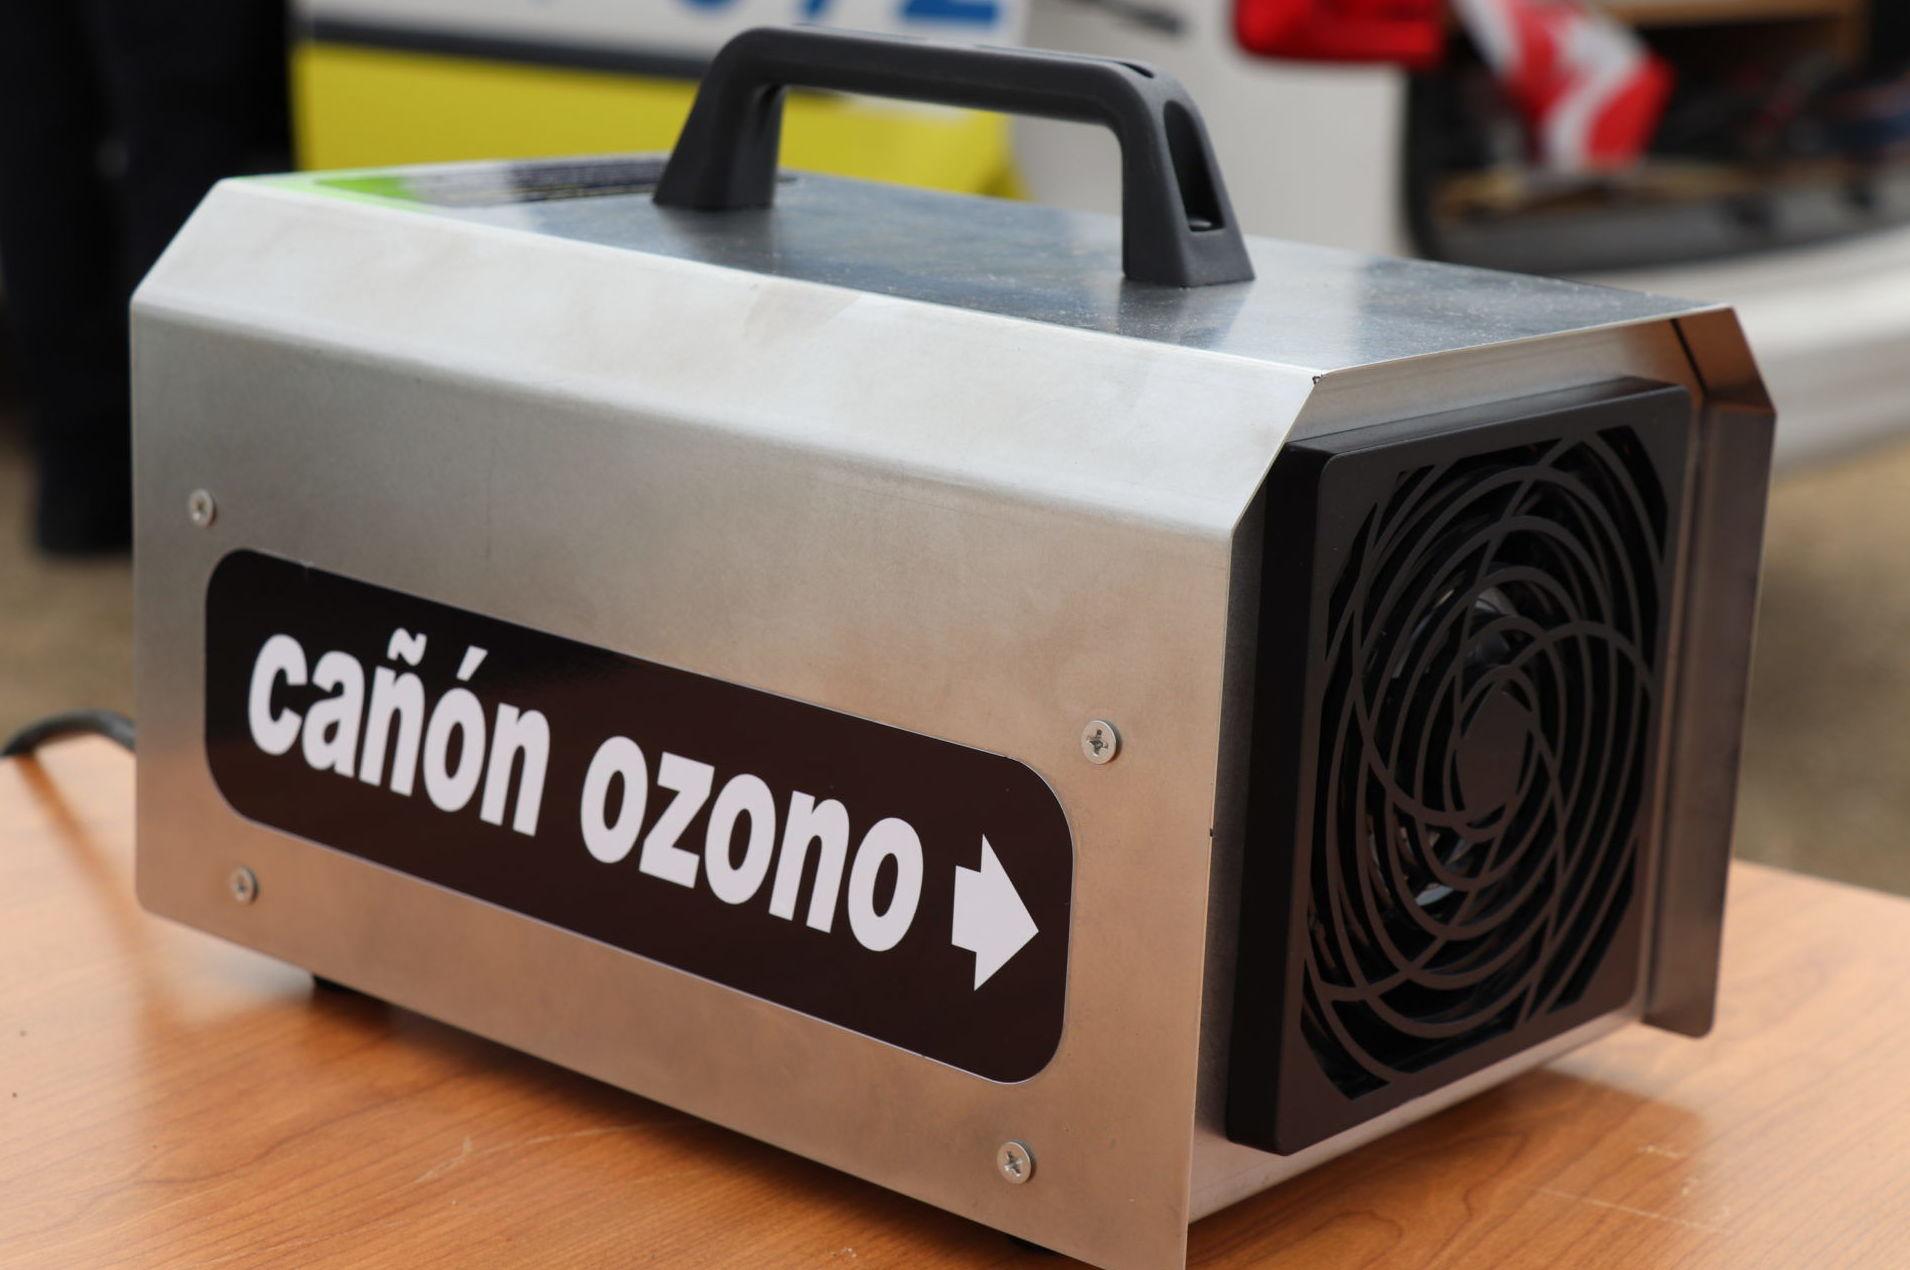 Desinfección cañon de ozono Oviedo